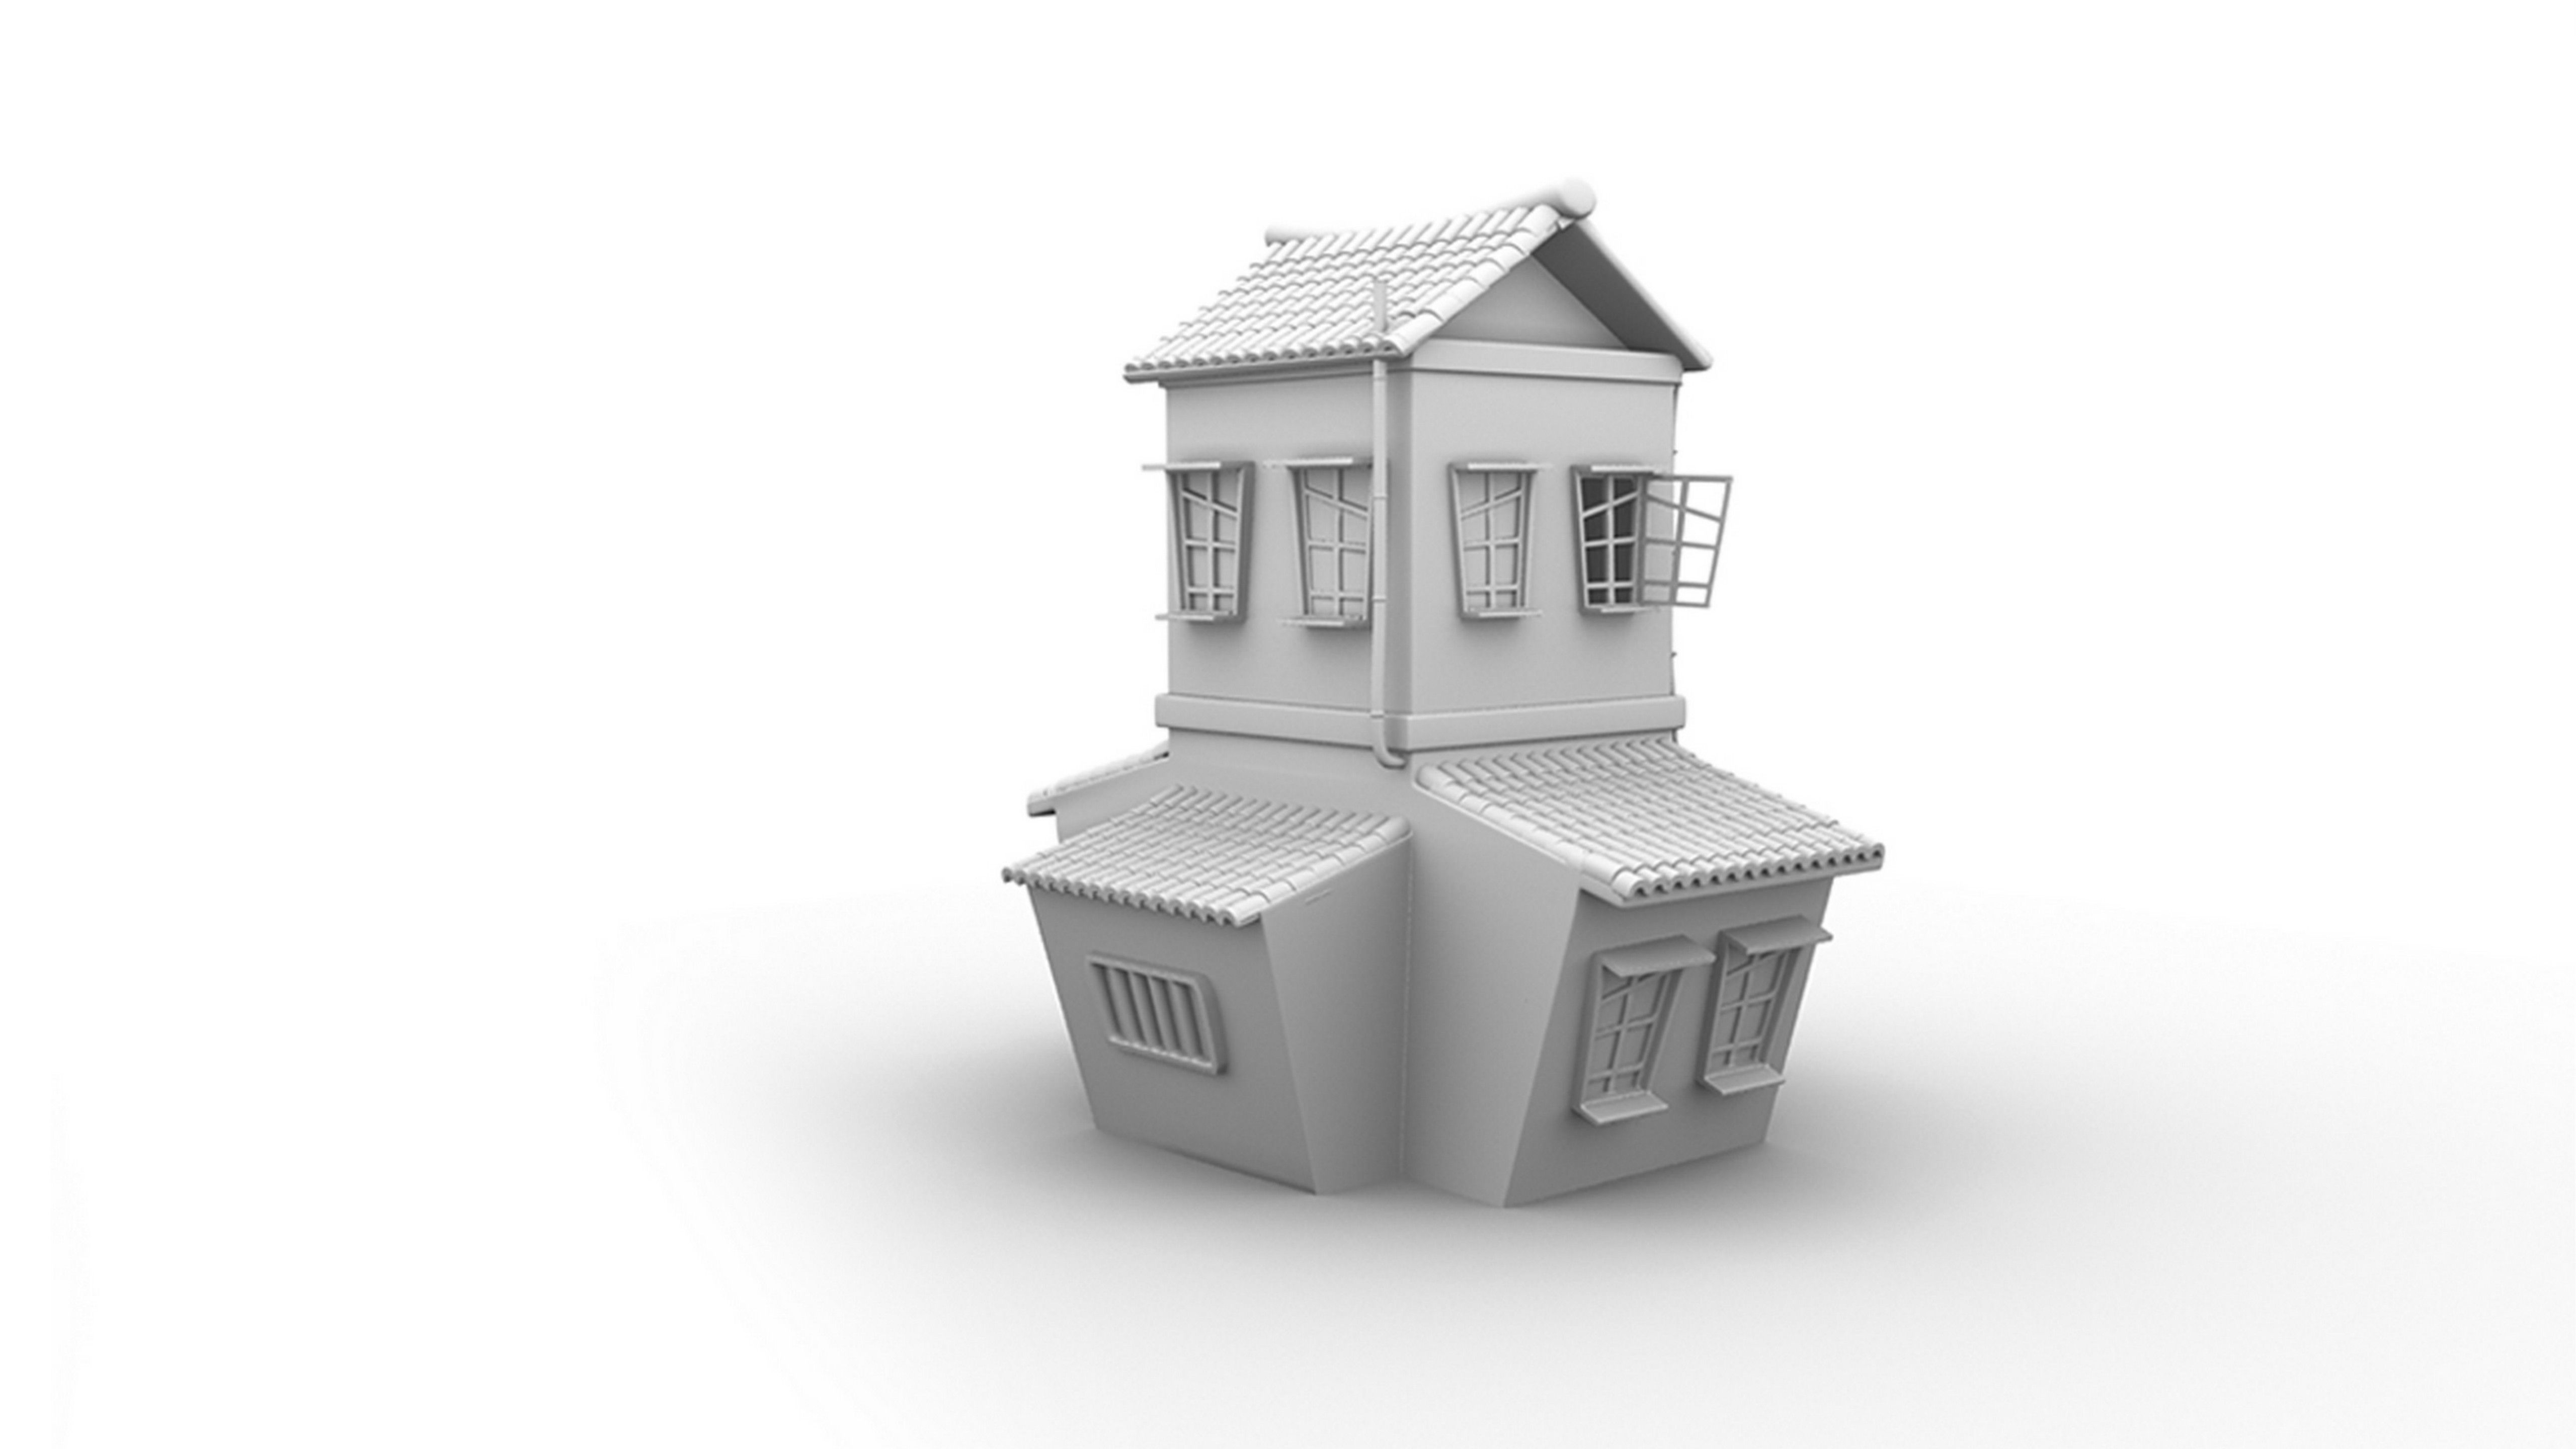 cartoon house 3d model | 3D work\'s | Pinterest | Cartoon house and 3d